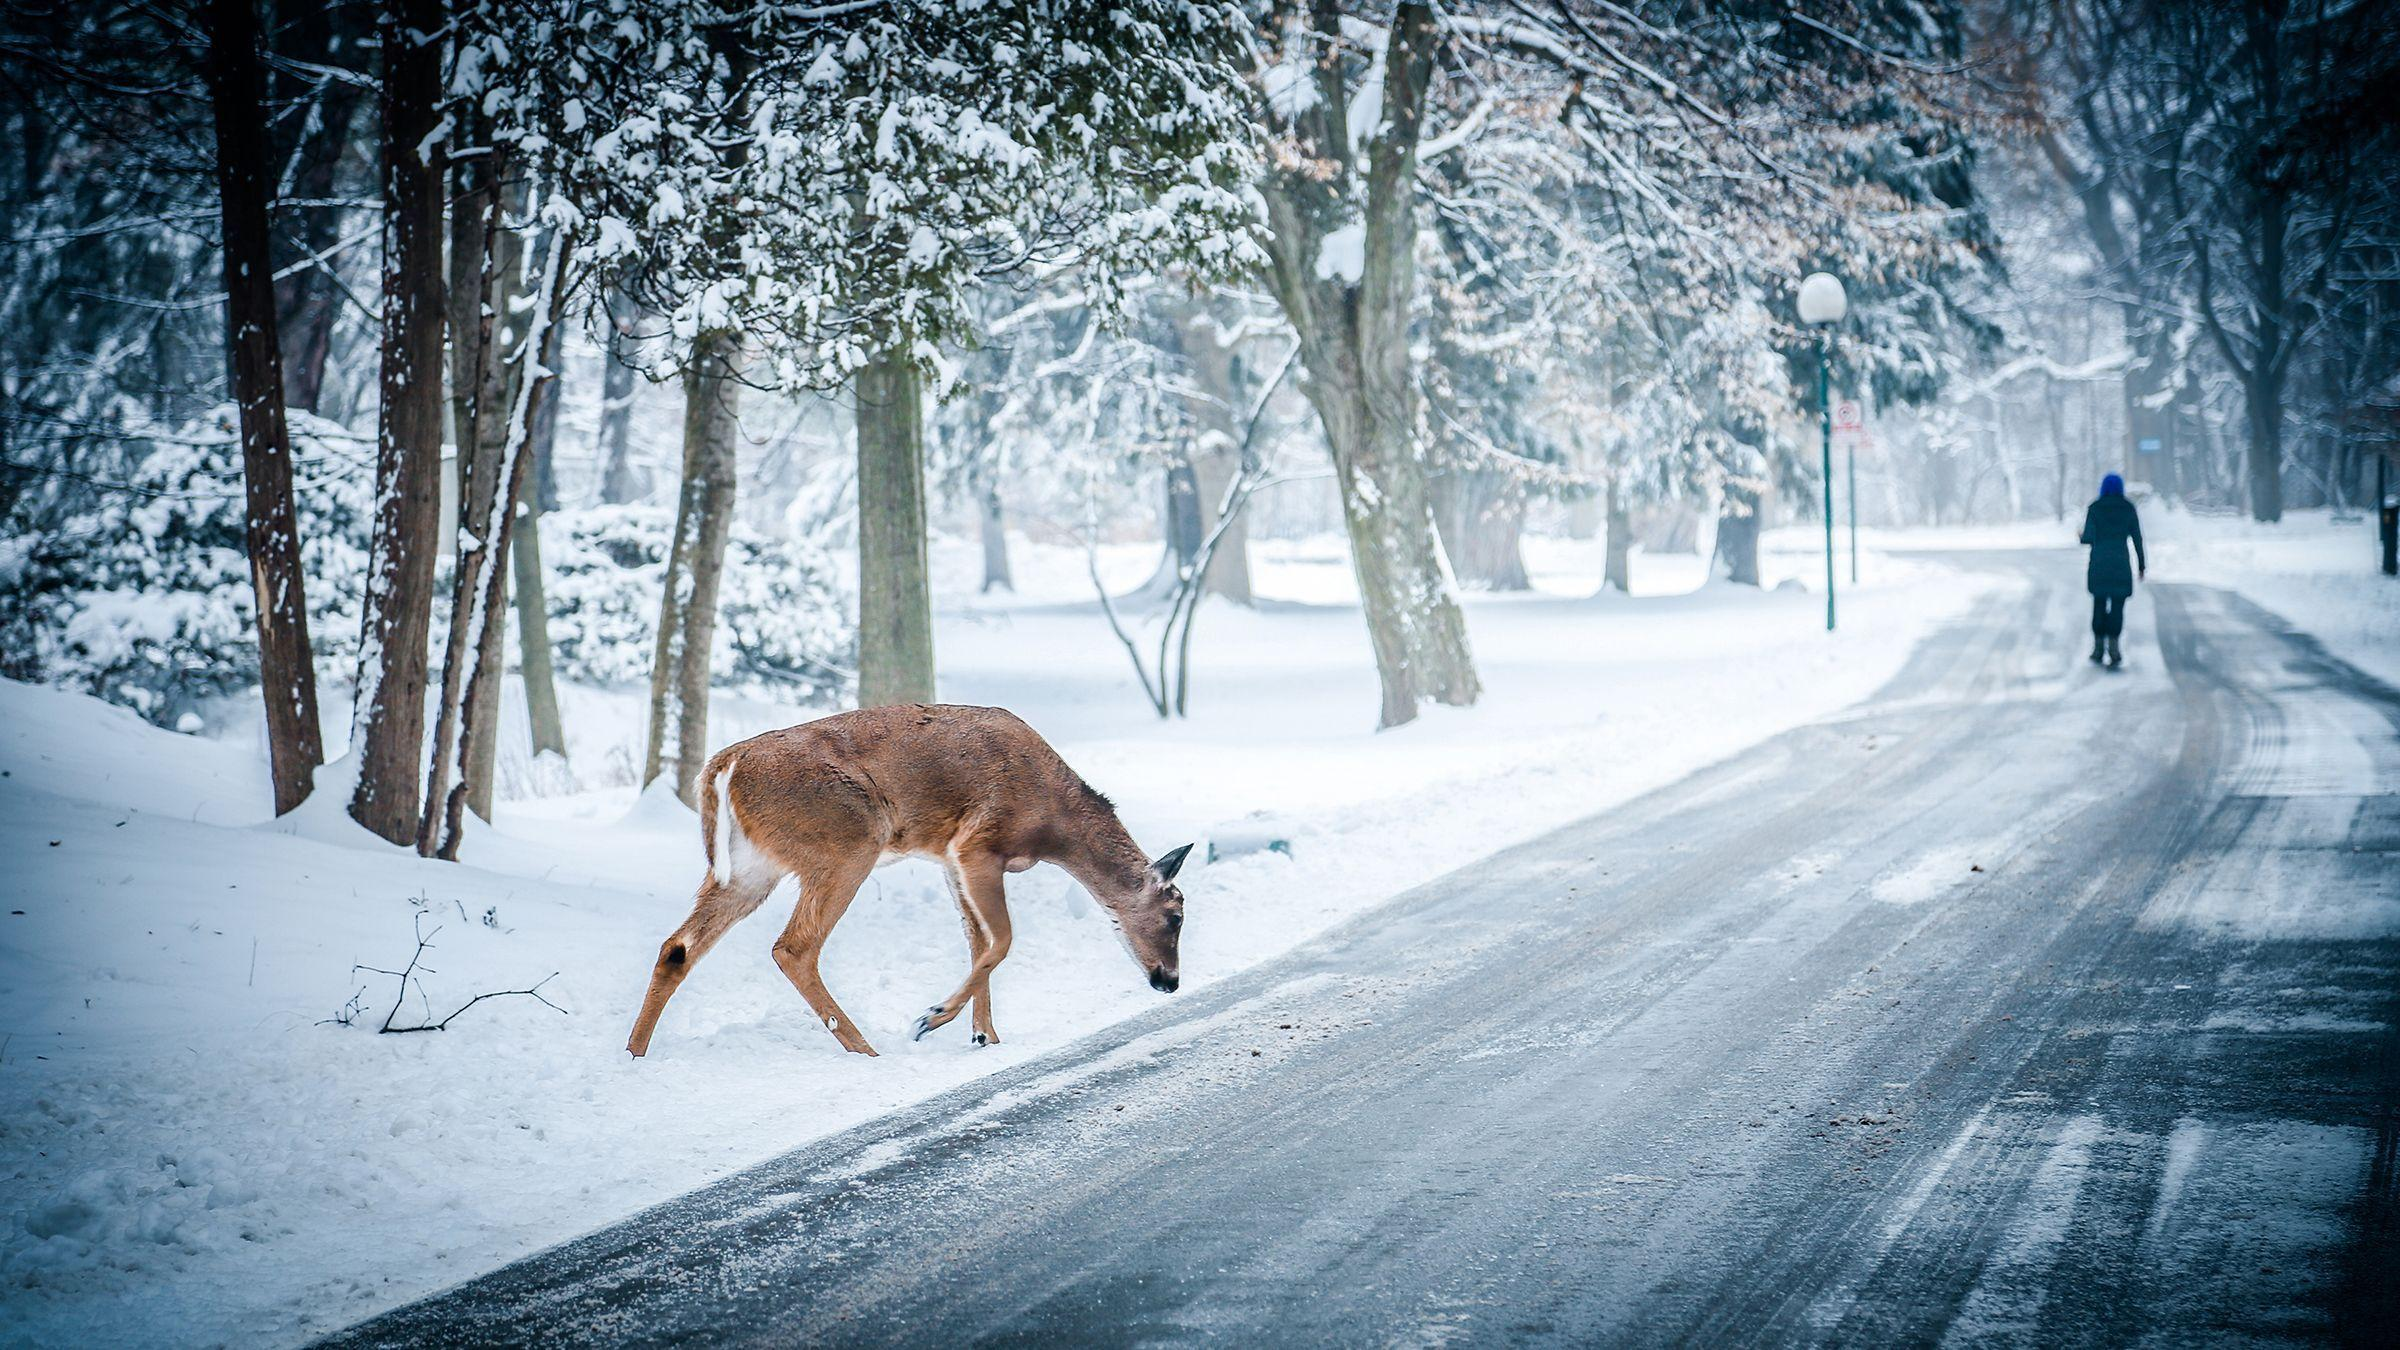 Winter Scene Desktop Wallpaper Desktop Wallpaper Snow Scenes 2400x1350 Download Hd Wallpaper Wallpapertip